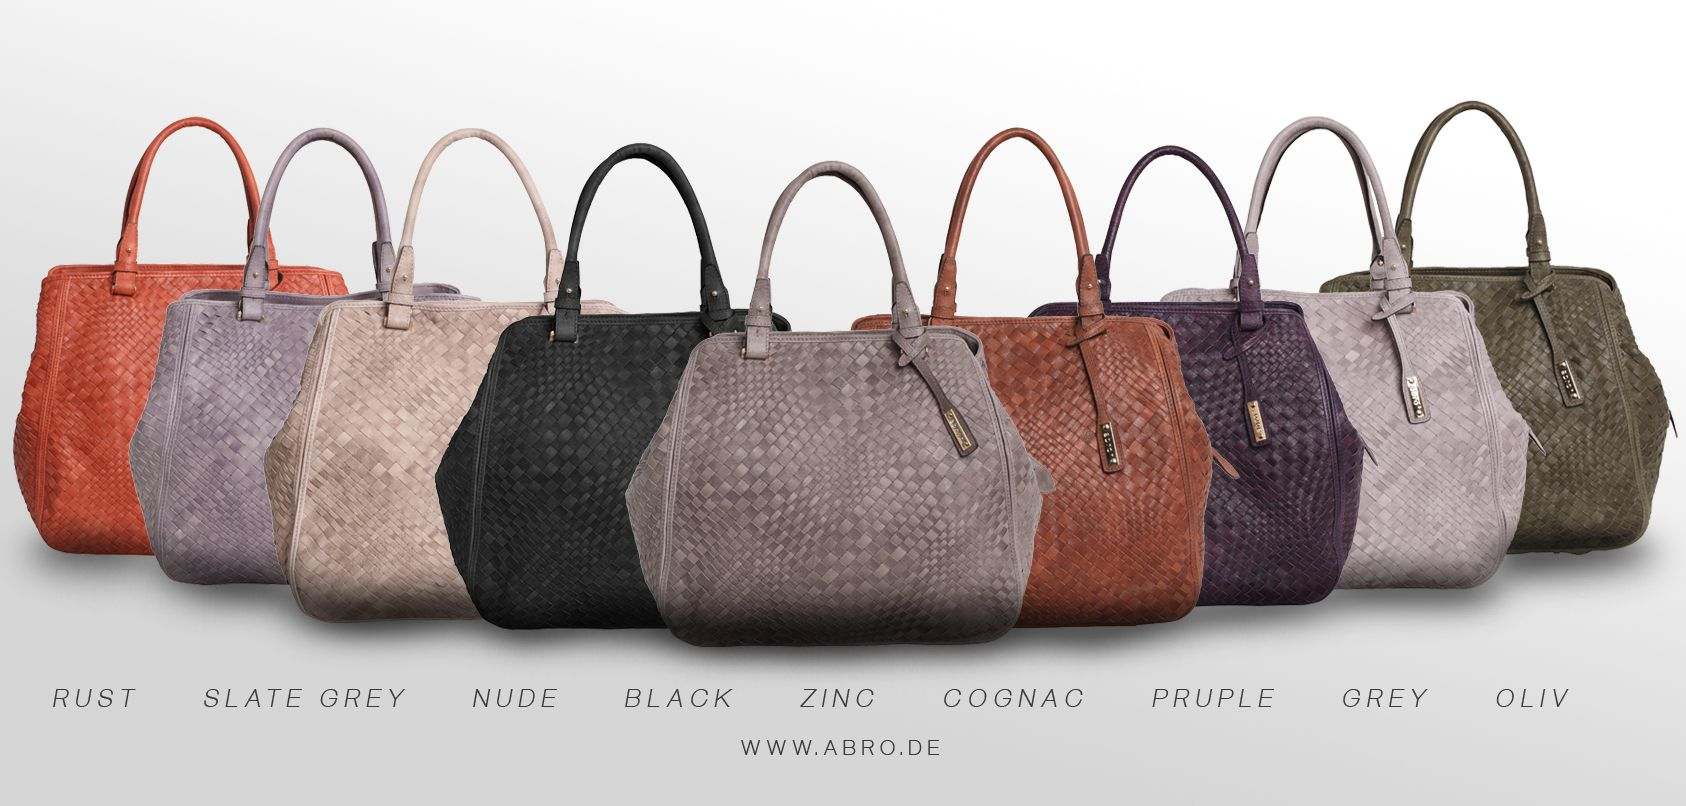 Abro Woven Bags Colorful Lederhandtaschen Taschen Shopper